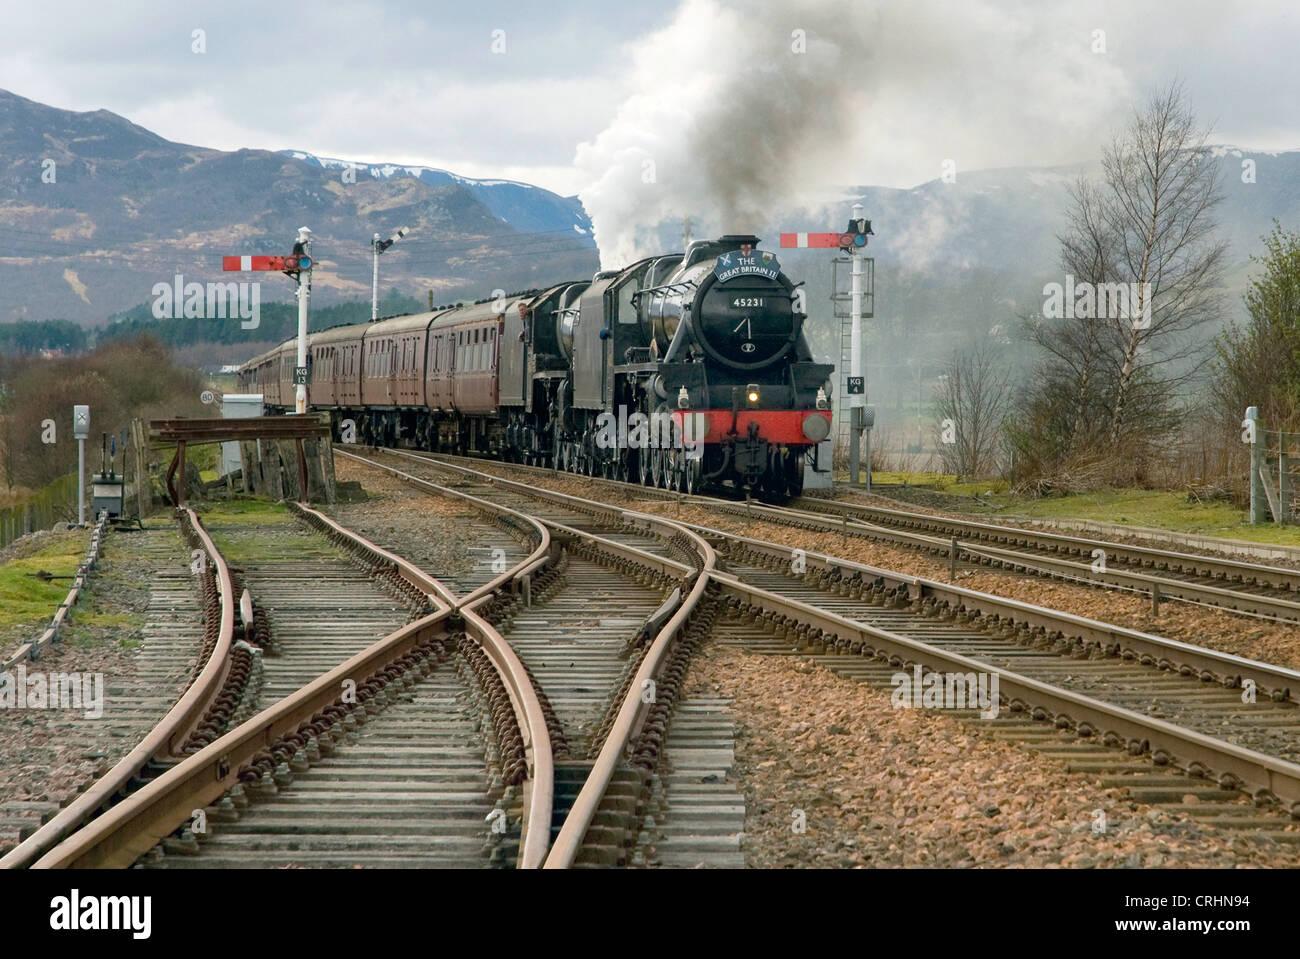 steam engine 45231 sherwood forester, approaching Kingussie, United Kingdom, Scotland - Stock Image